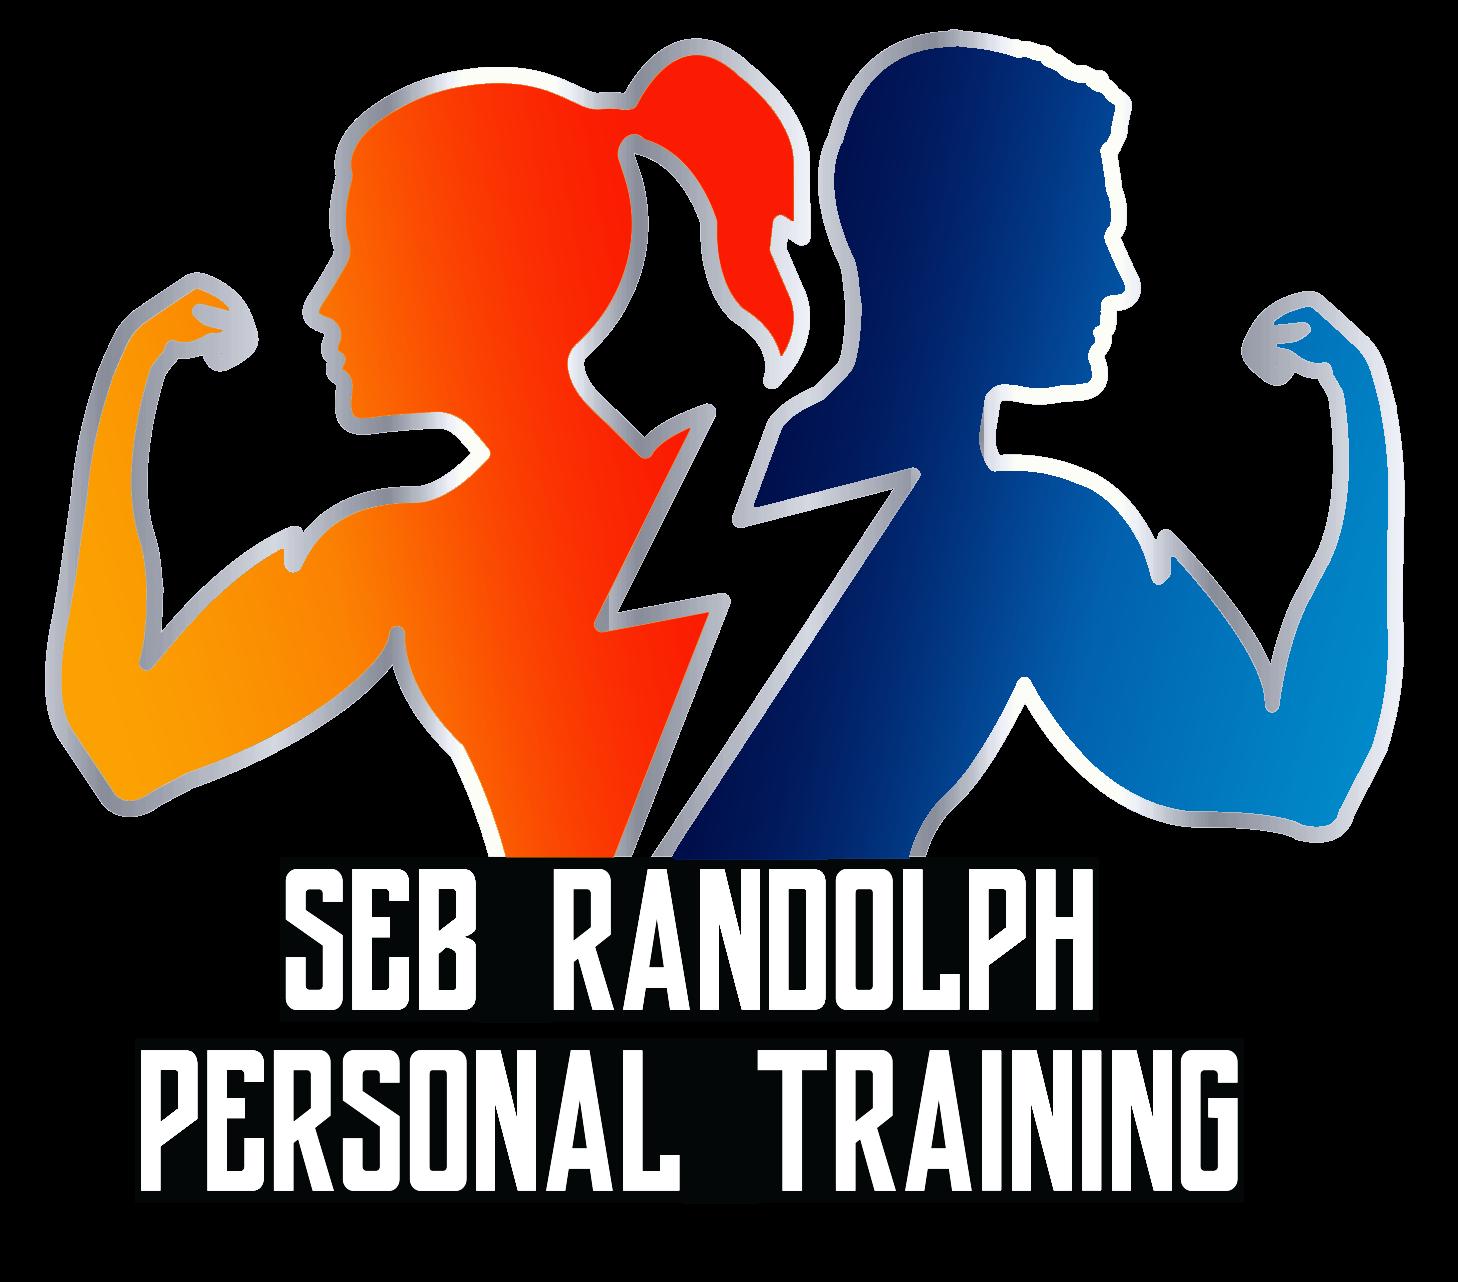 SRPT - Seb Randolph Personal Trainer